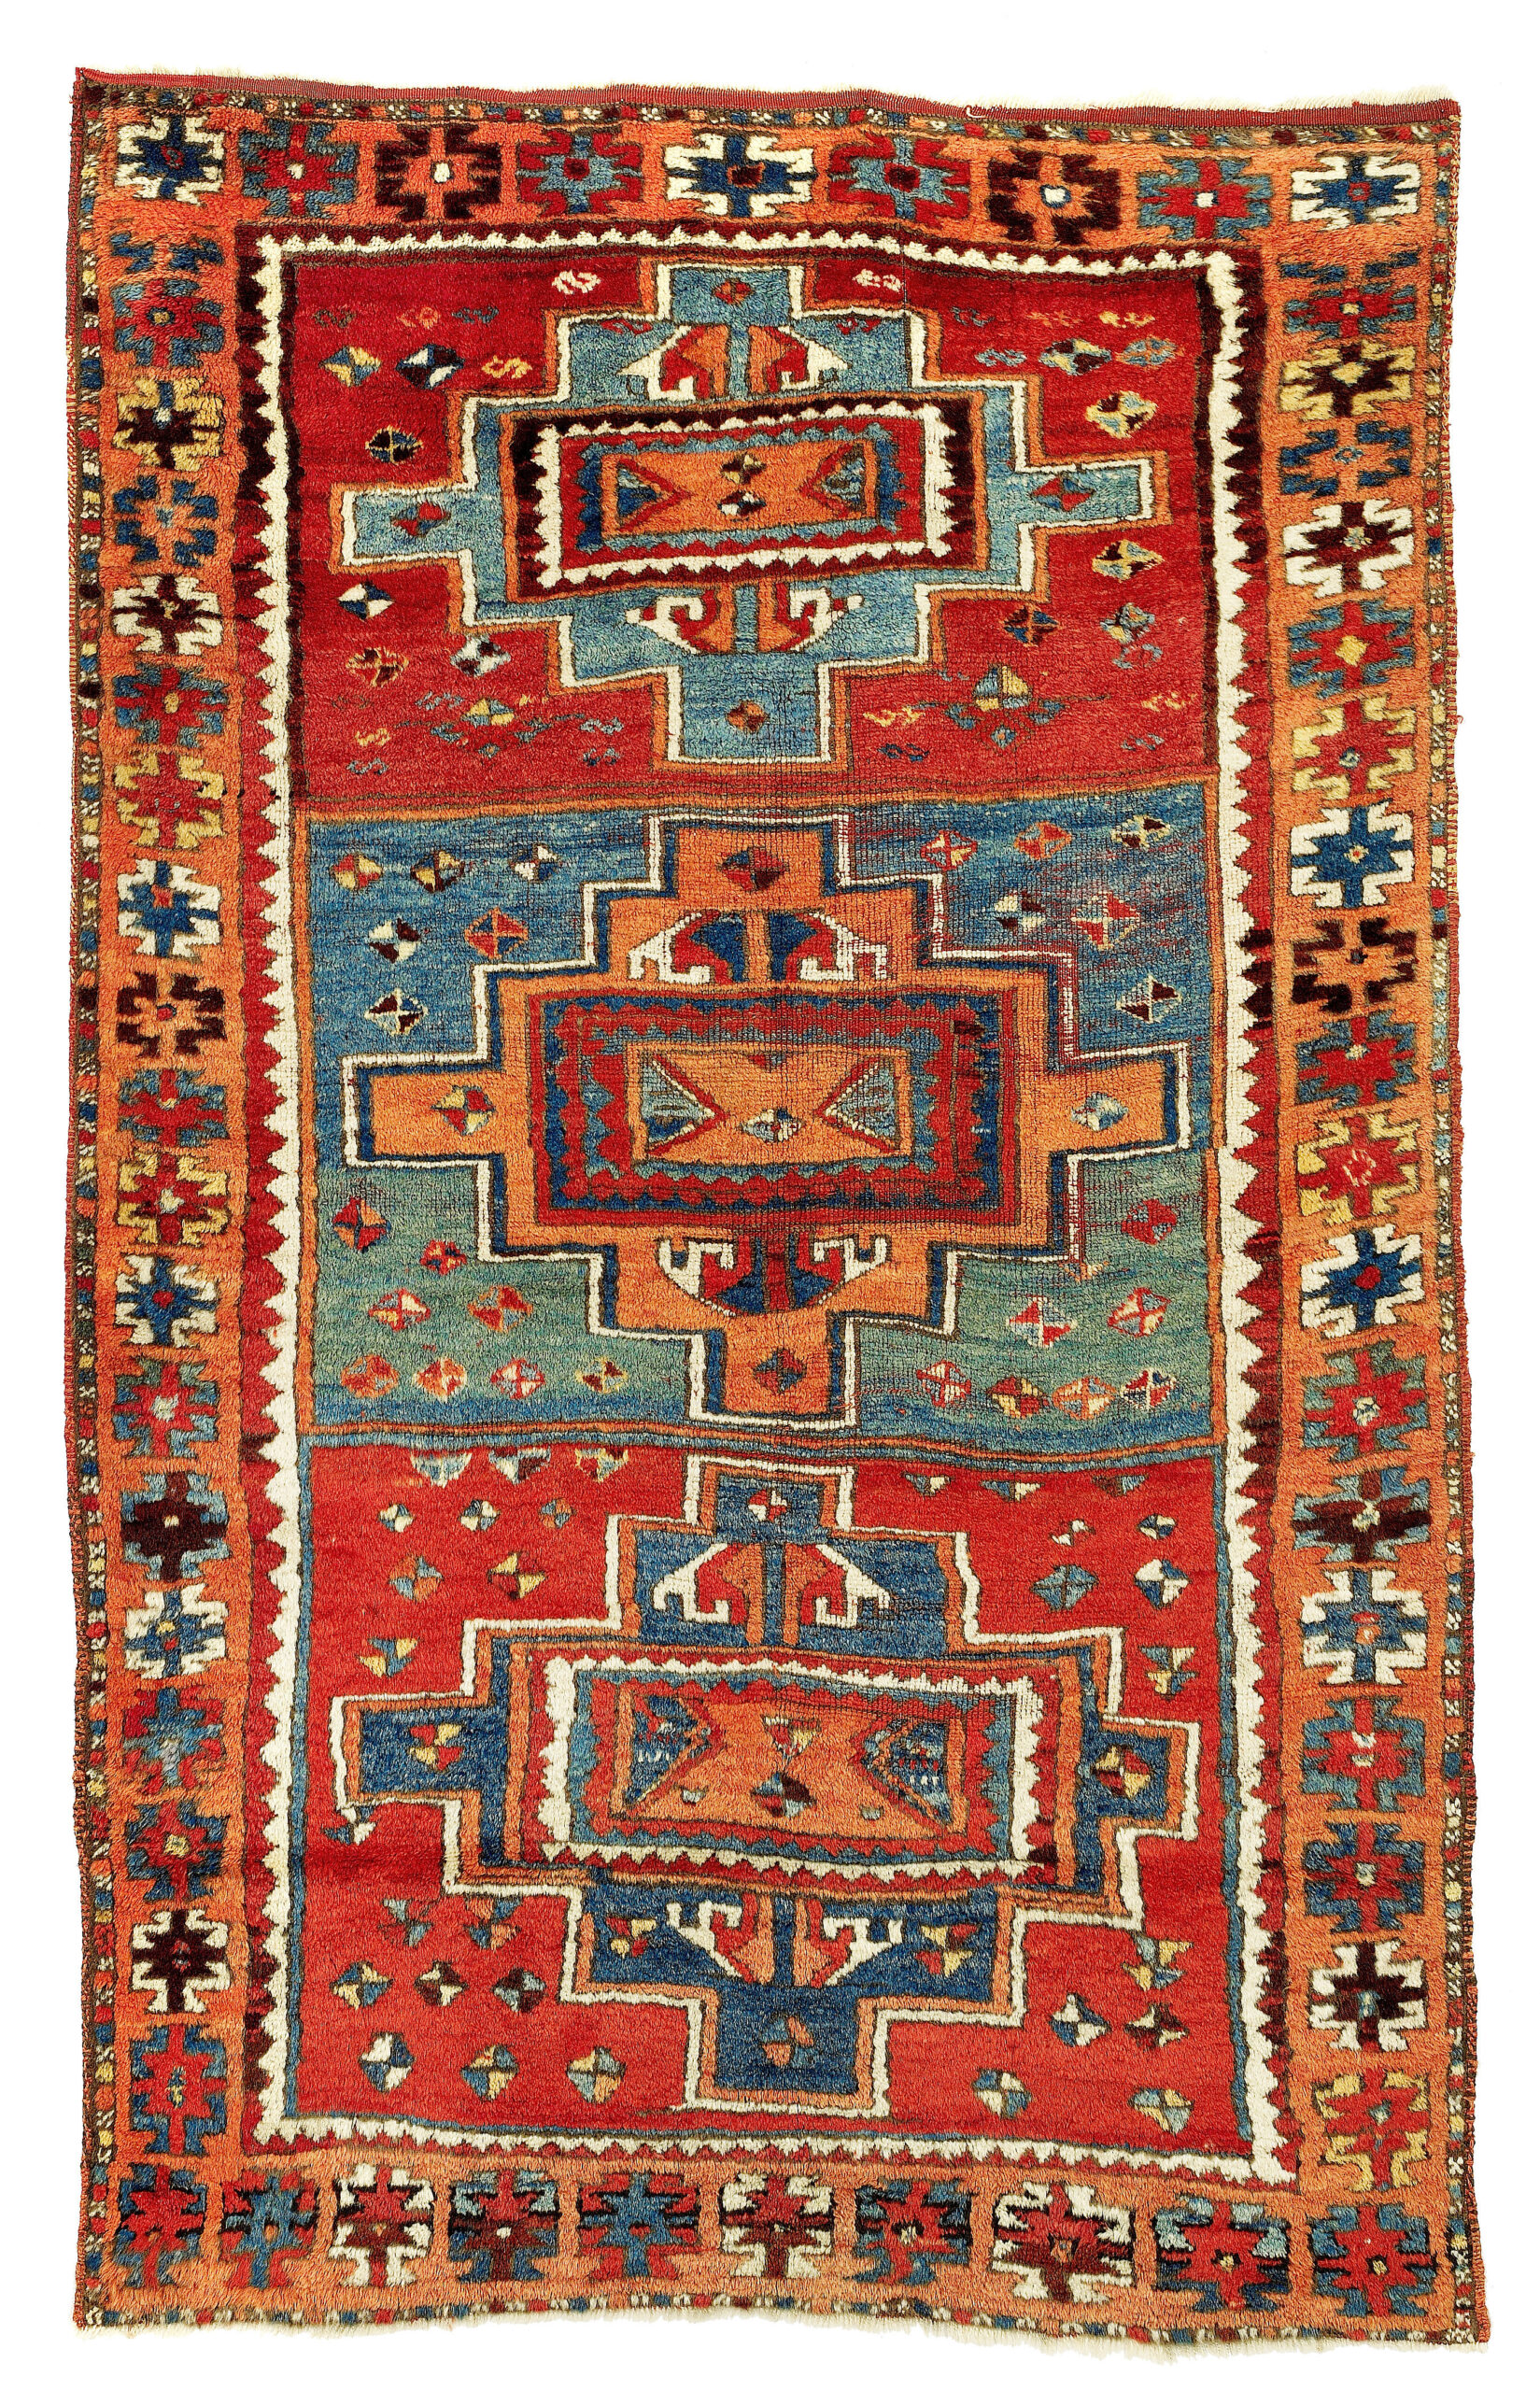 Antique East Anatolian carpet, Sarkisla, Sivas, mid-19th century